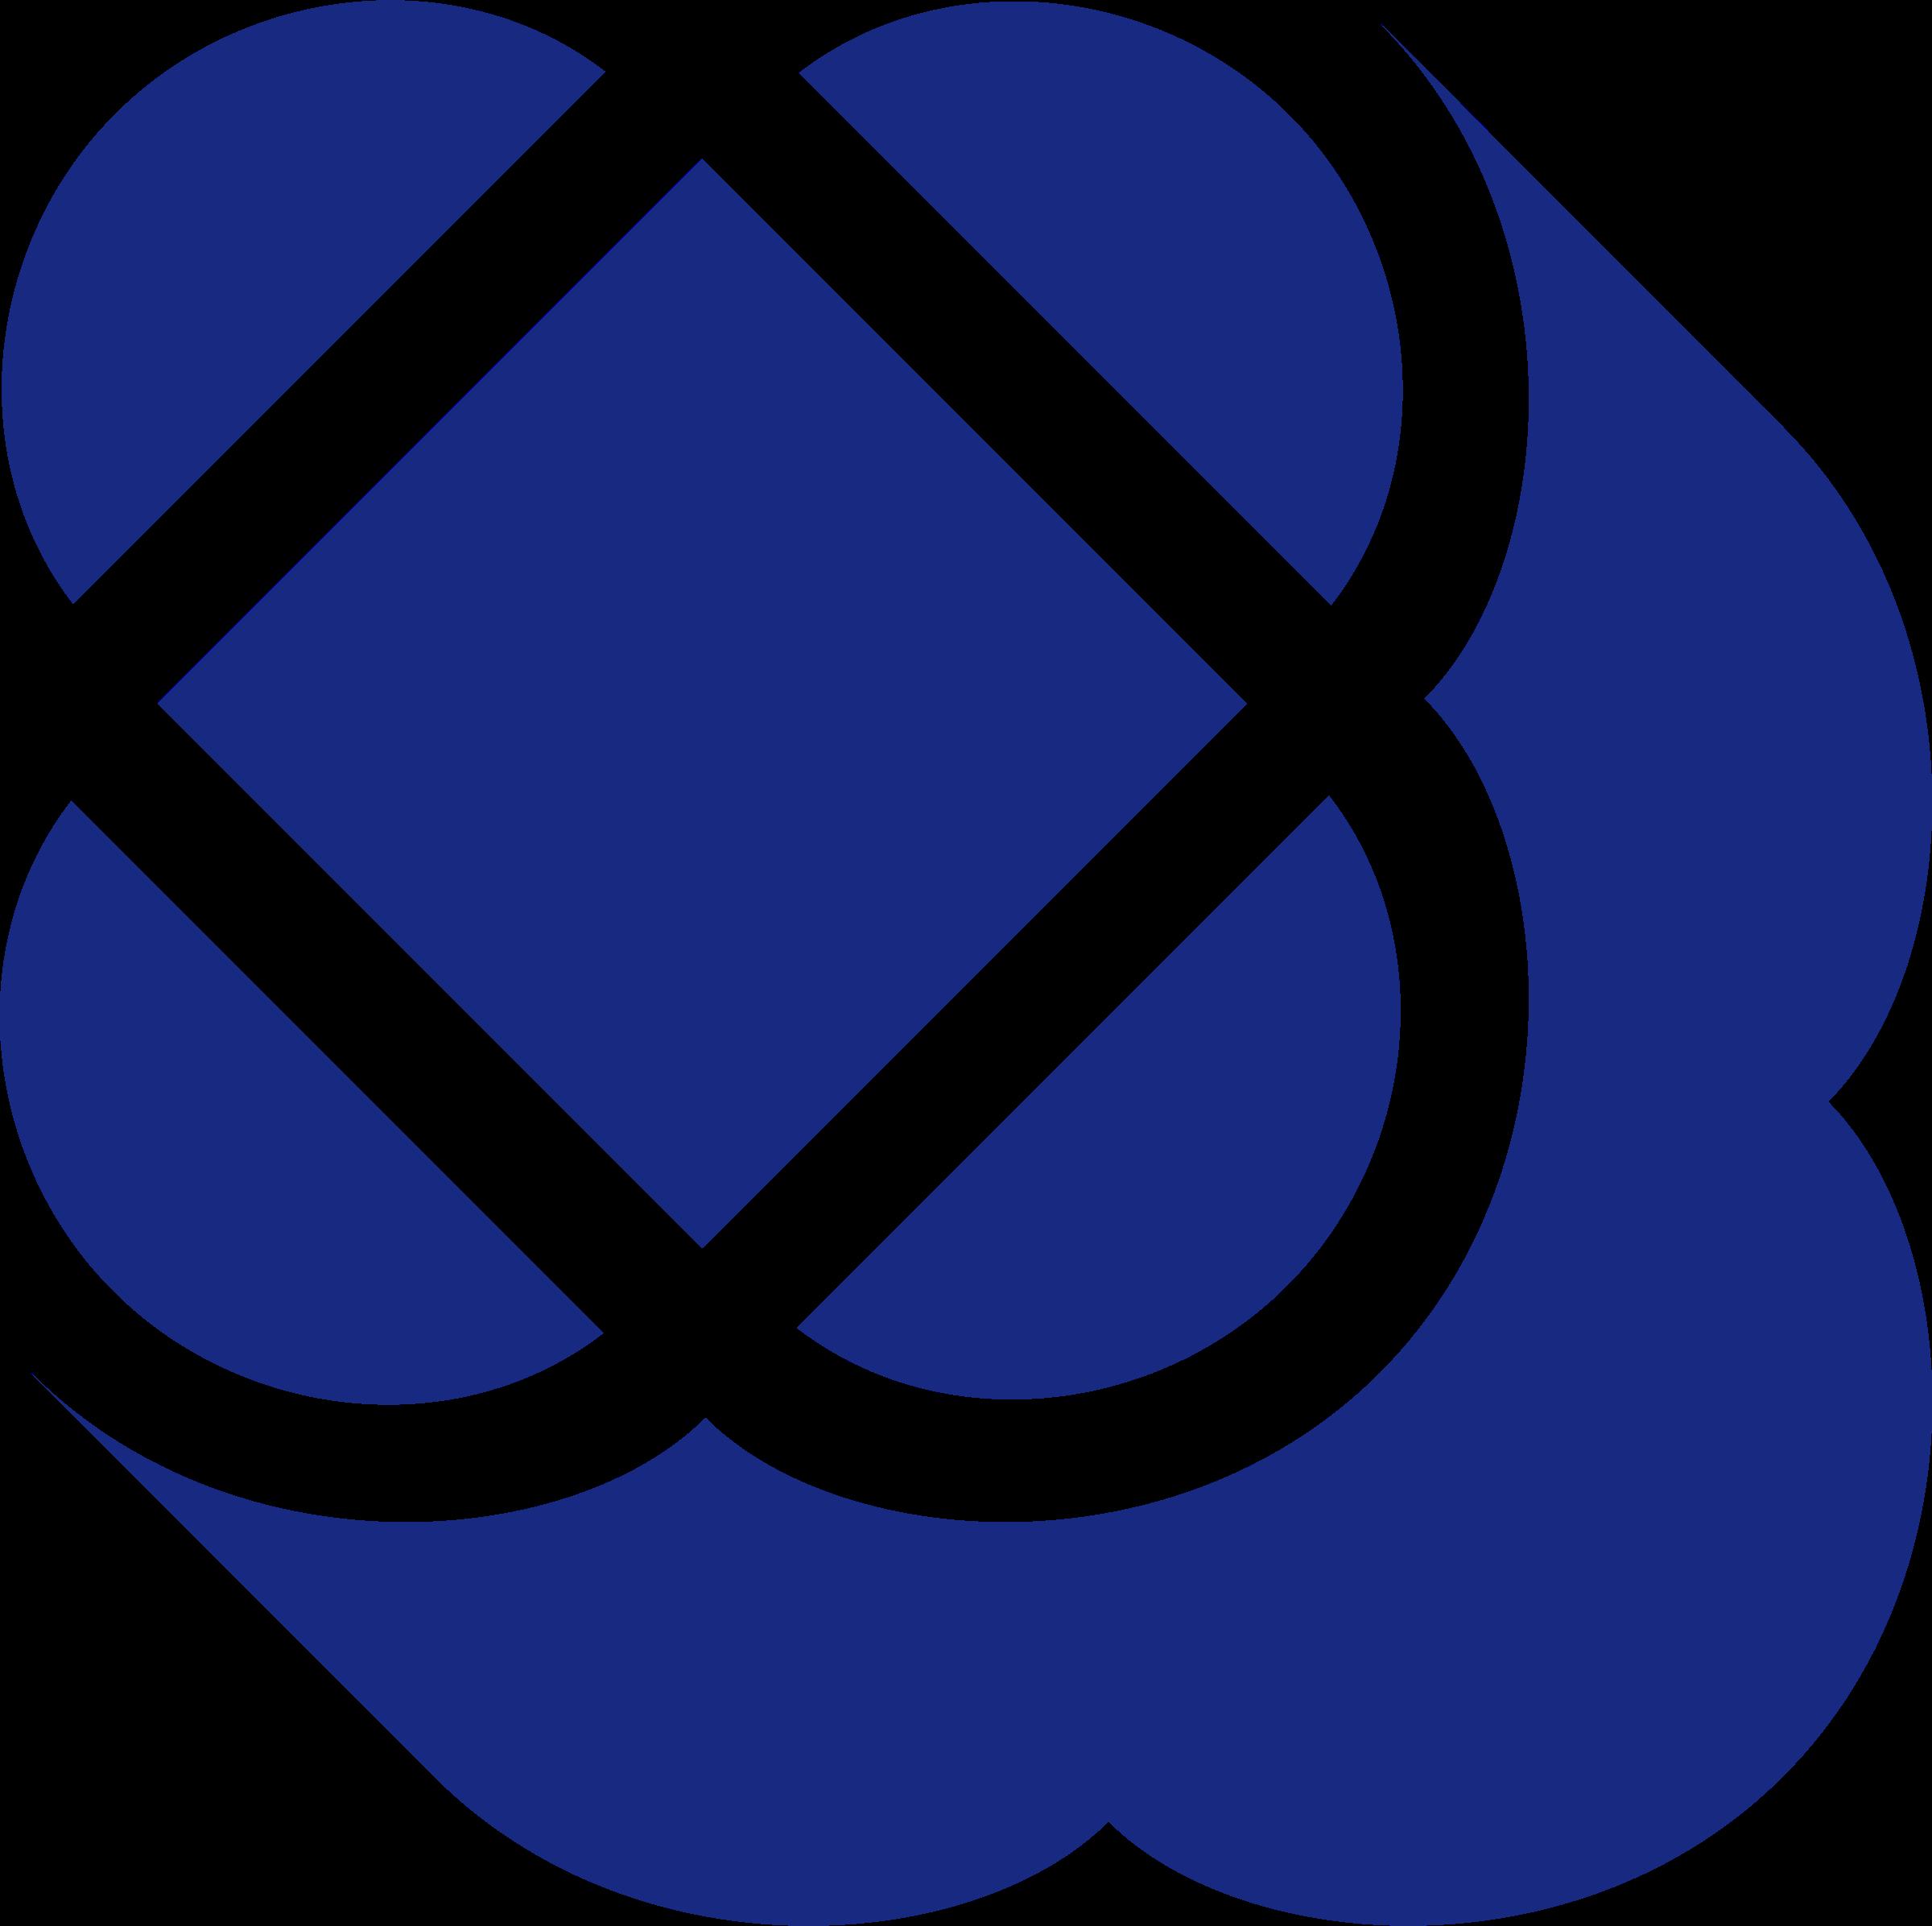 Clover clipart trebol. Logo icons png free